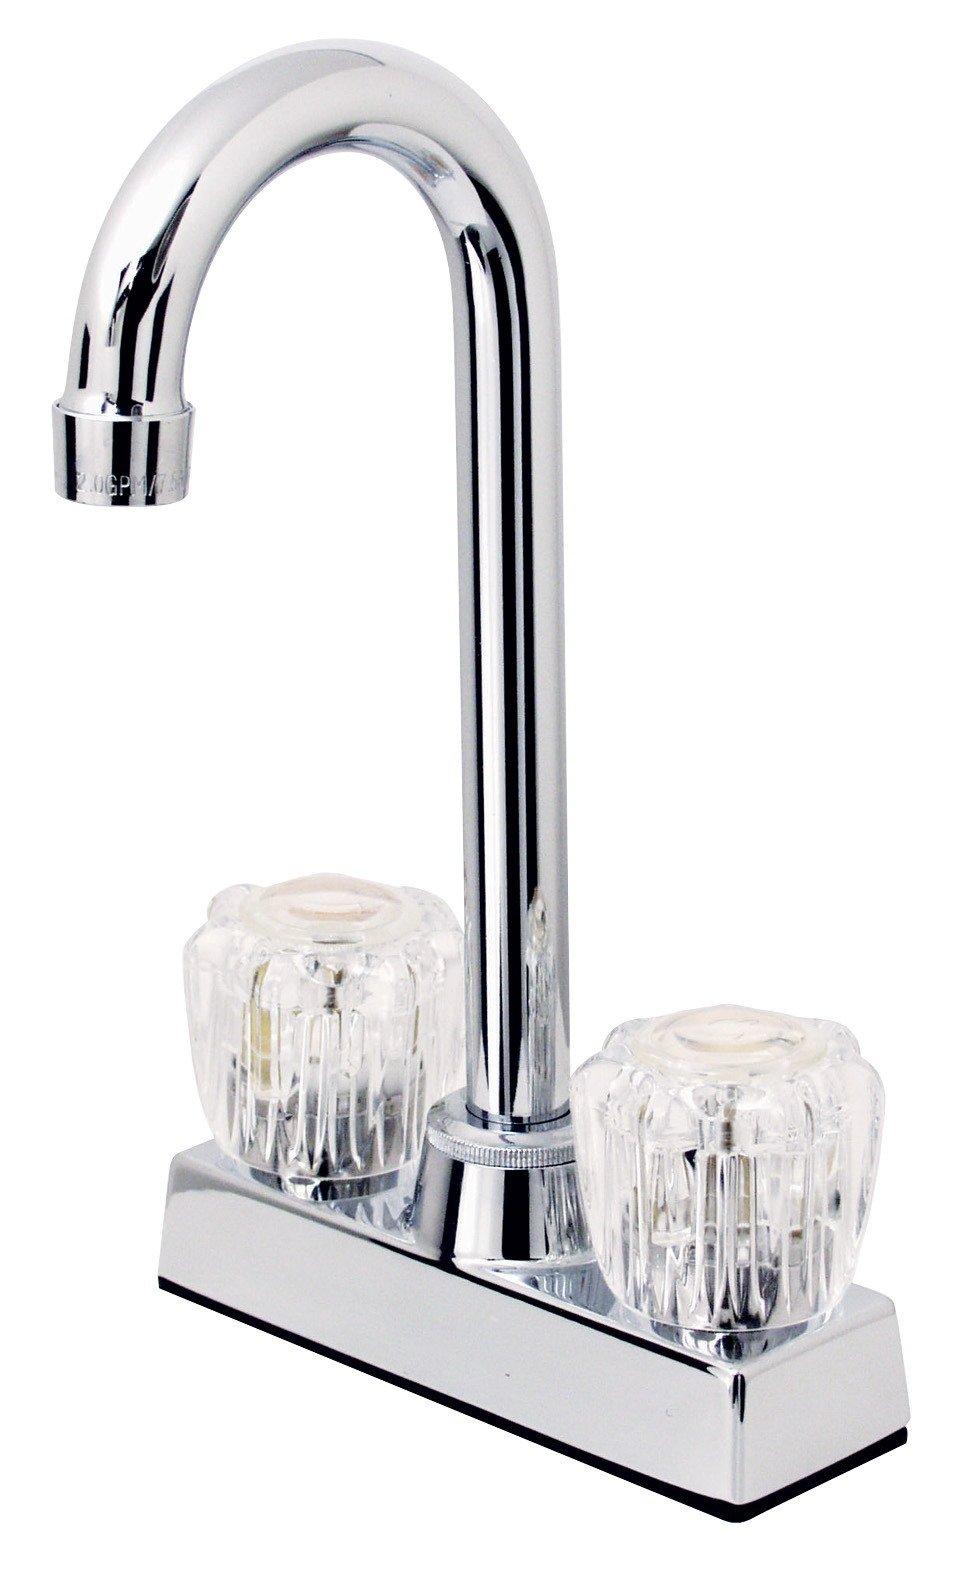 Hardware House 124997 2-Handle High Rise Bar Faucet, Chrome